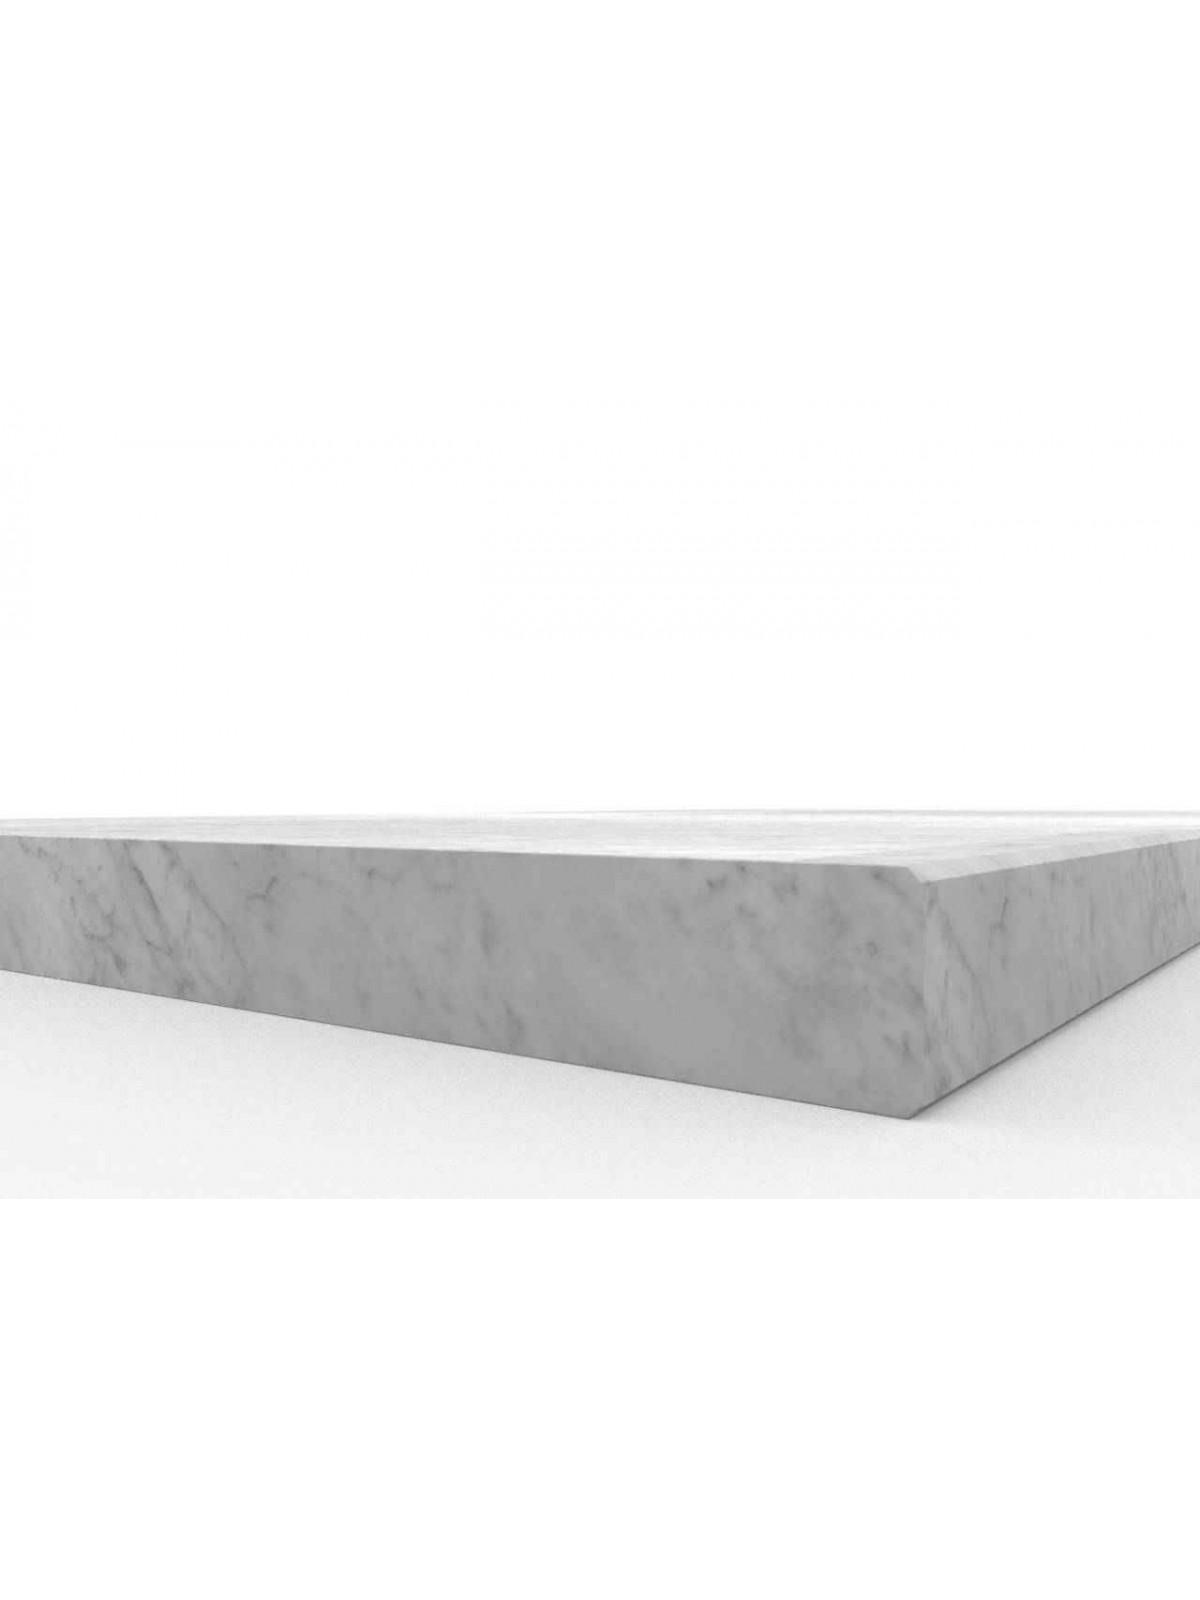 Trittstufe in Bianco Carrara